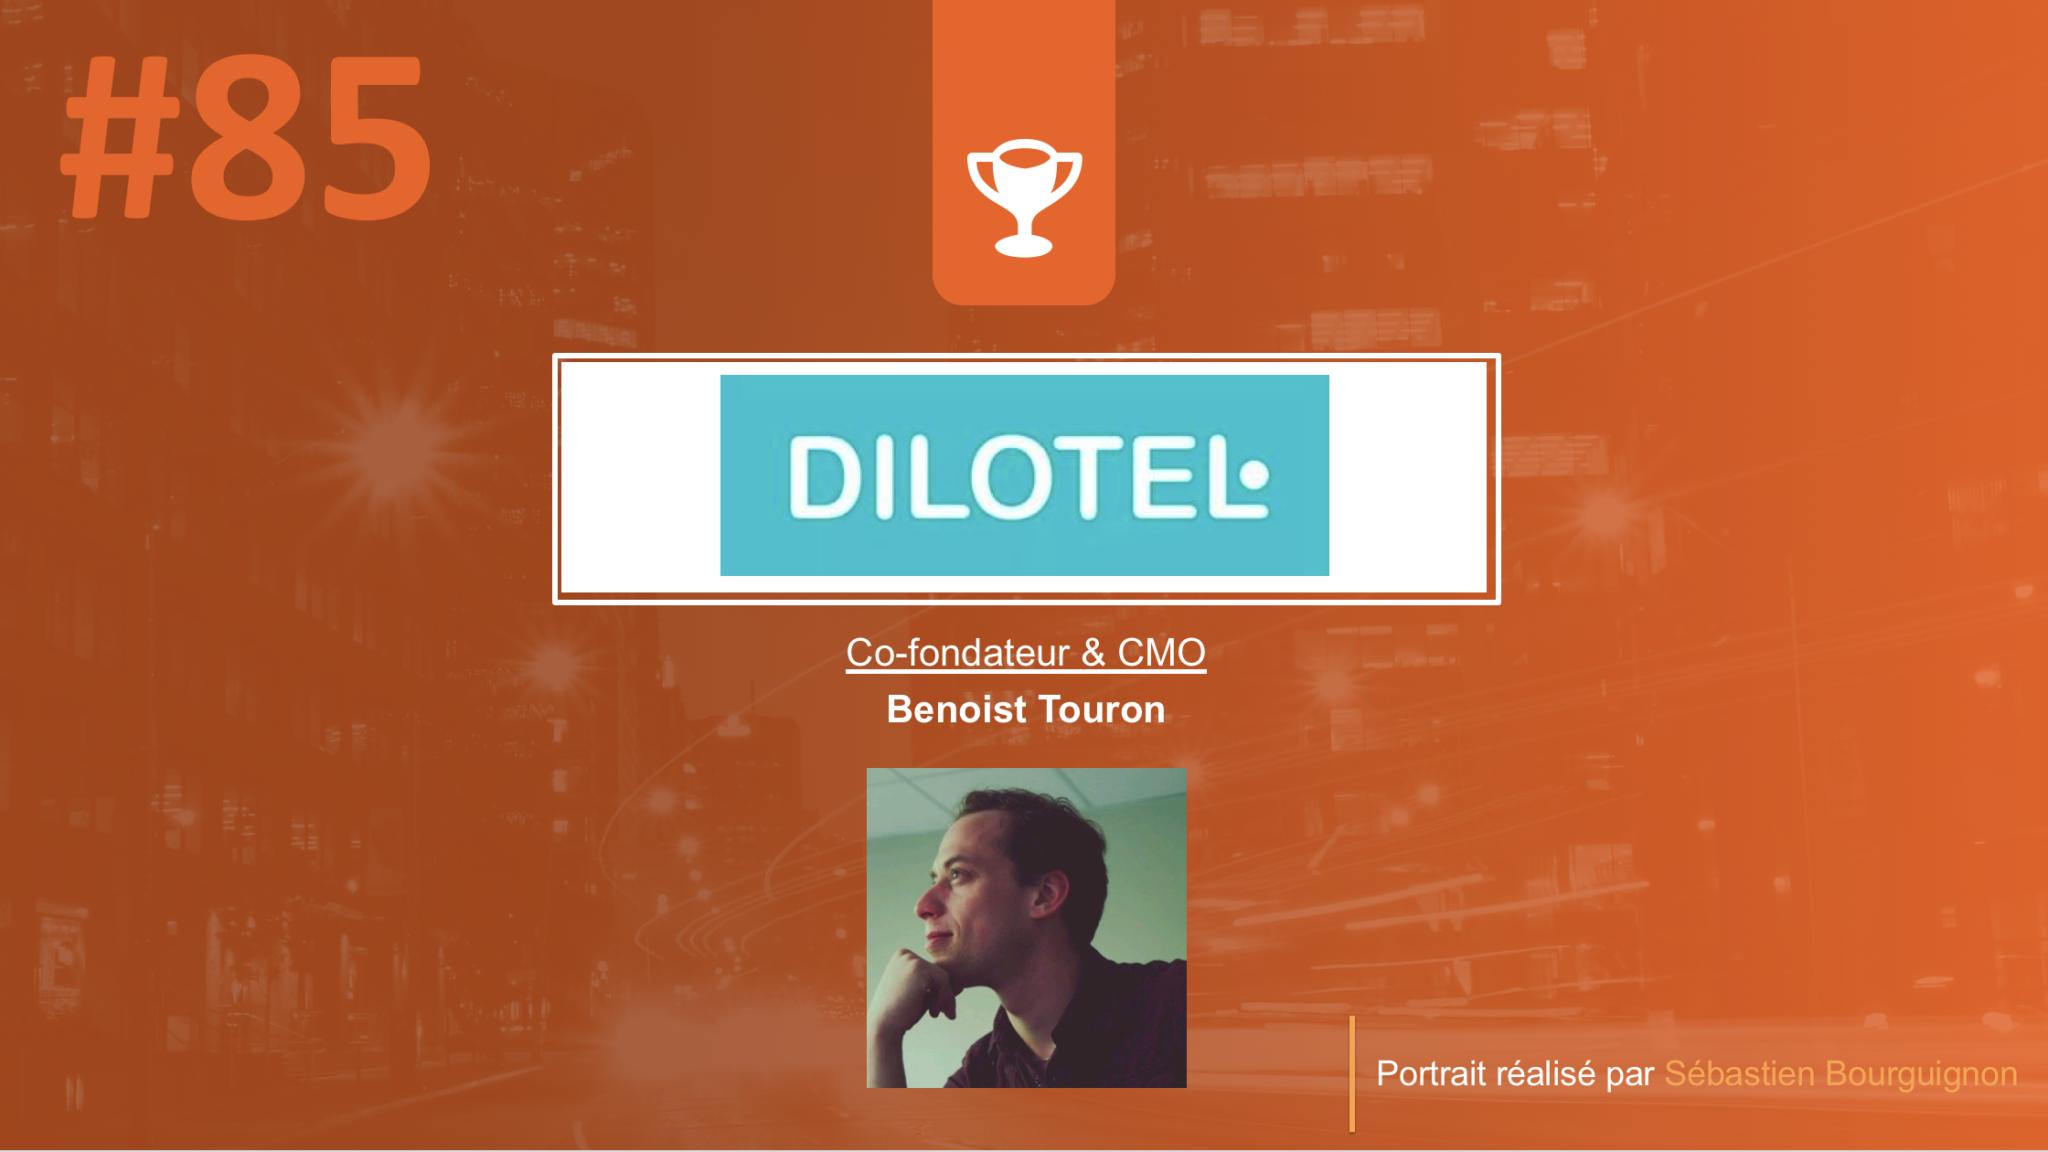 dilotel